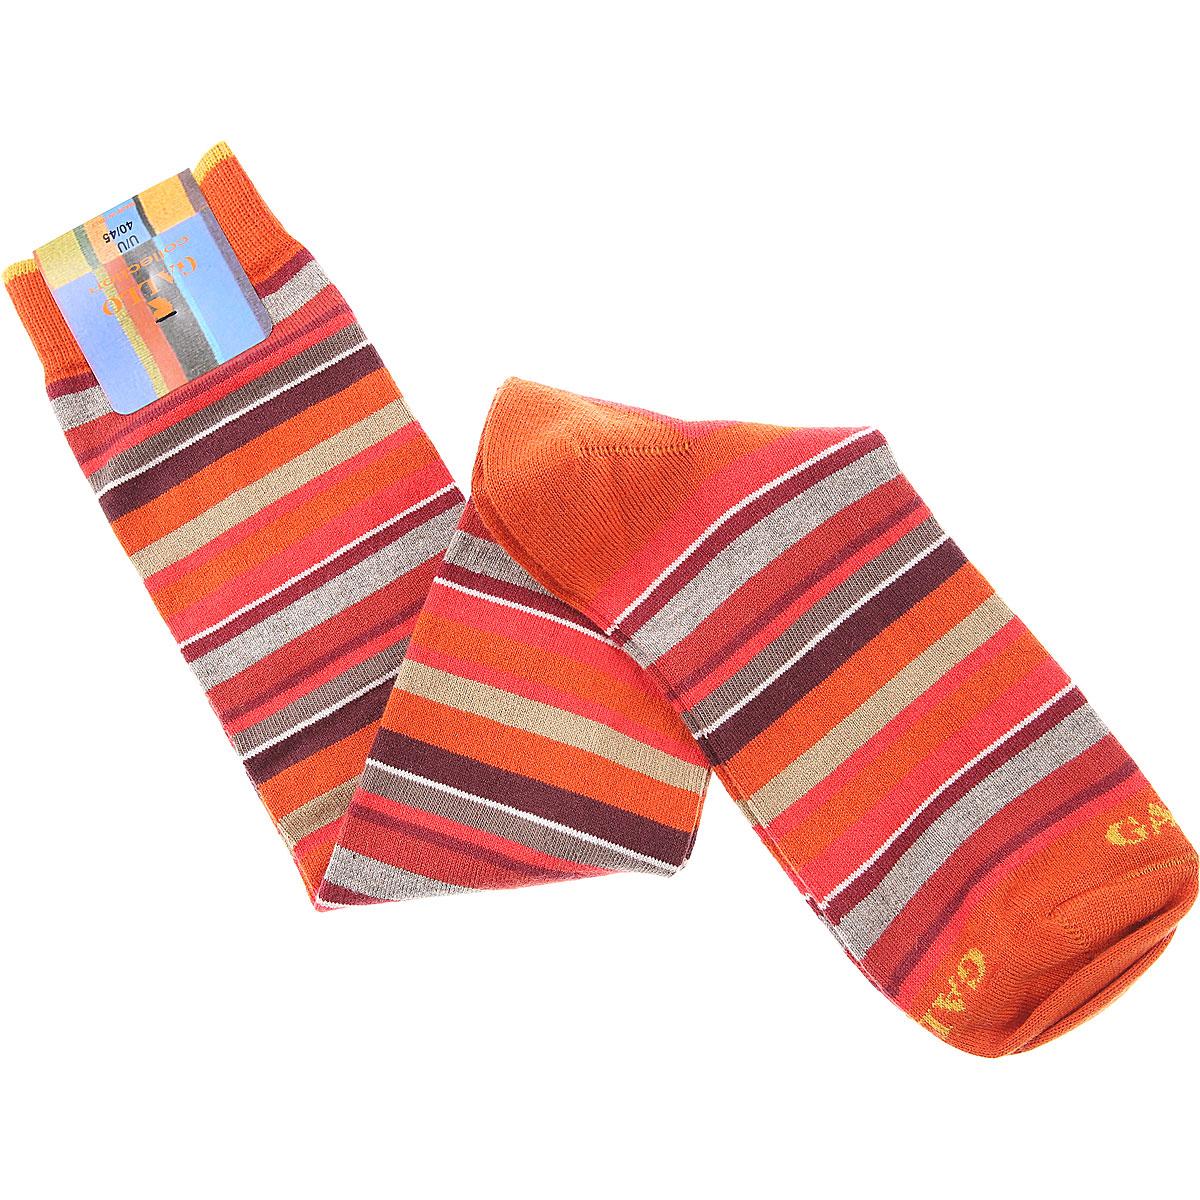 Gallo Socks Mens Underwear On Sale, Orange, Cotton, 2019